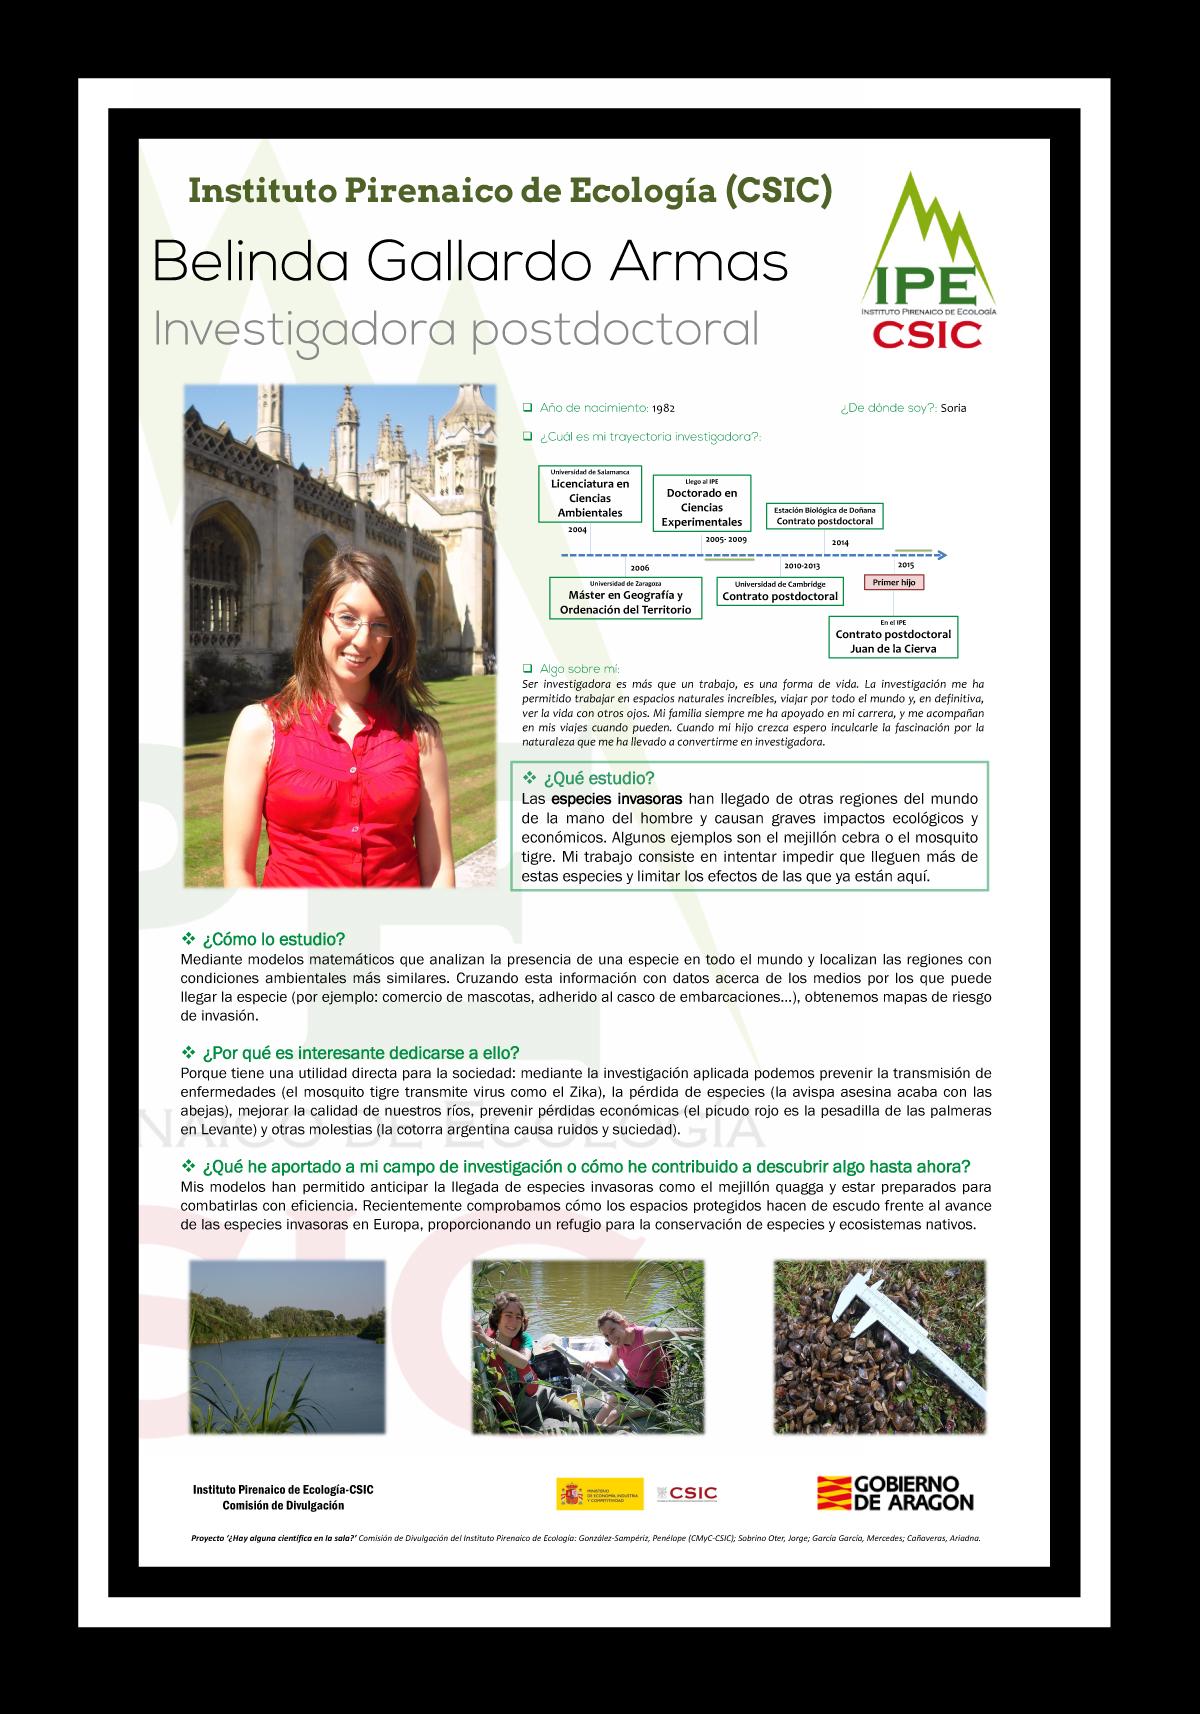 Belinda Gallardo Armas